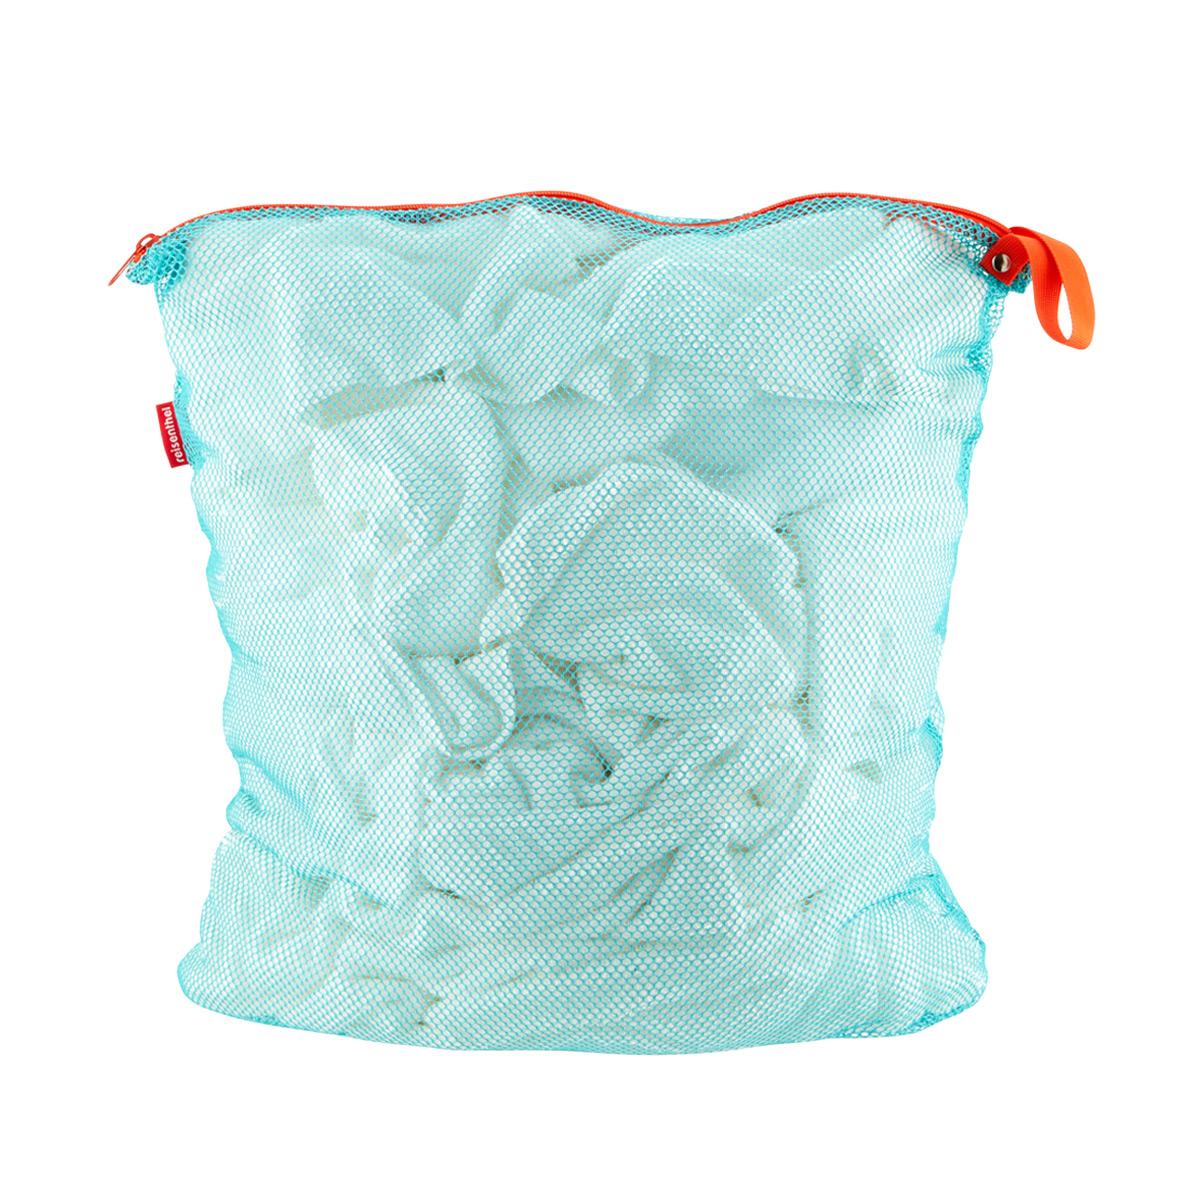 Mesh Sac L Turquoise